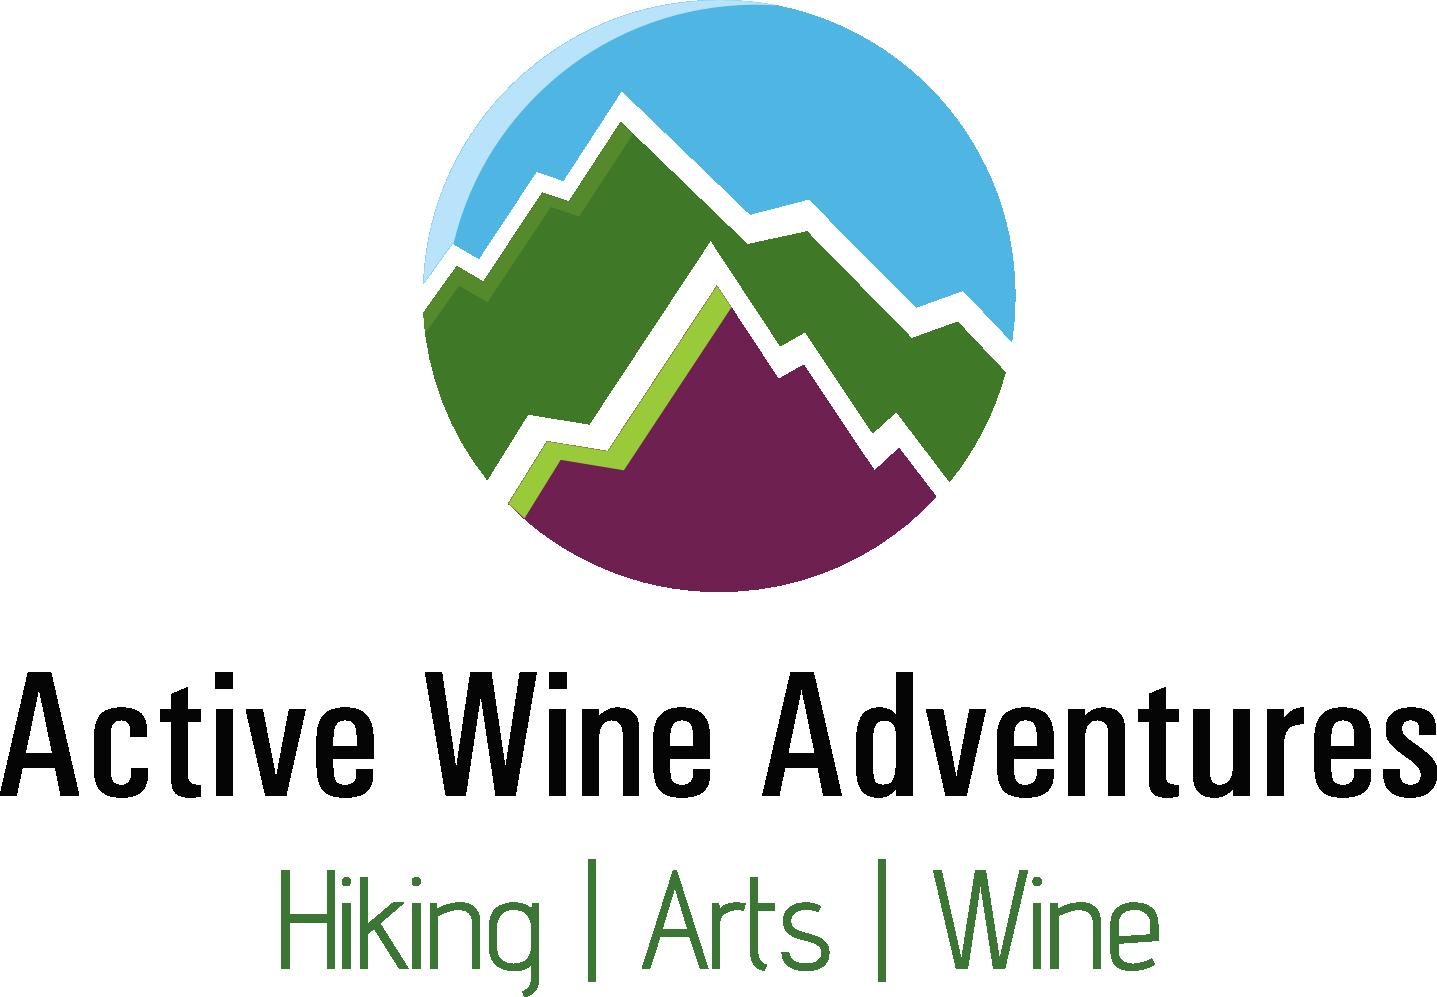 Active Wine Adventures | Links | Wine, Hiking & Art Tours | Napa